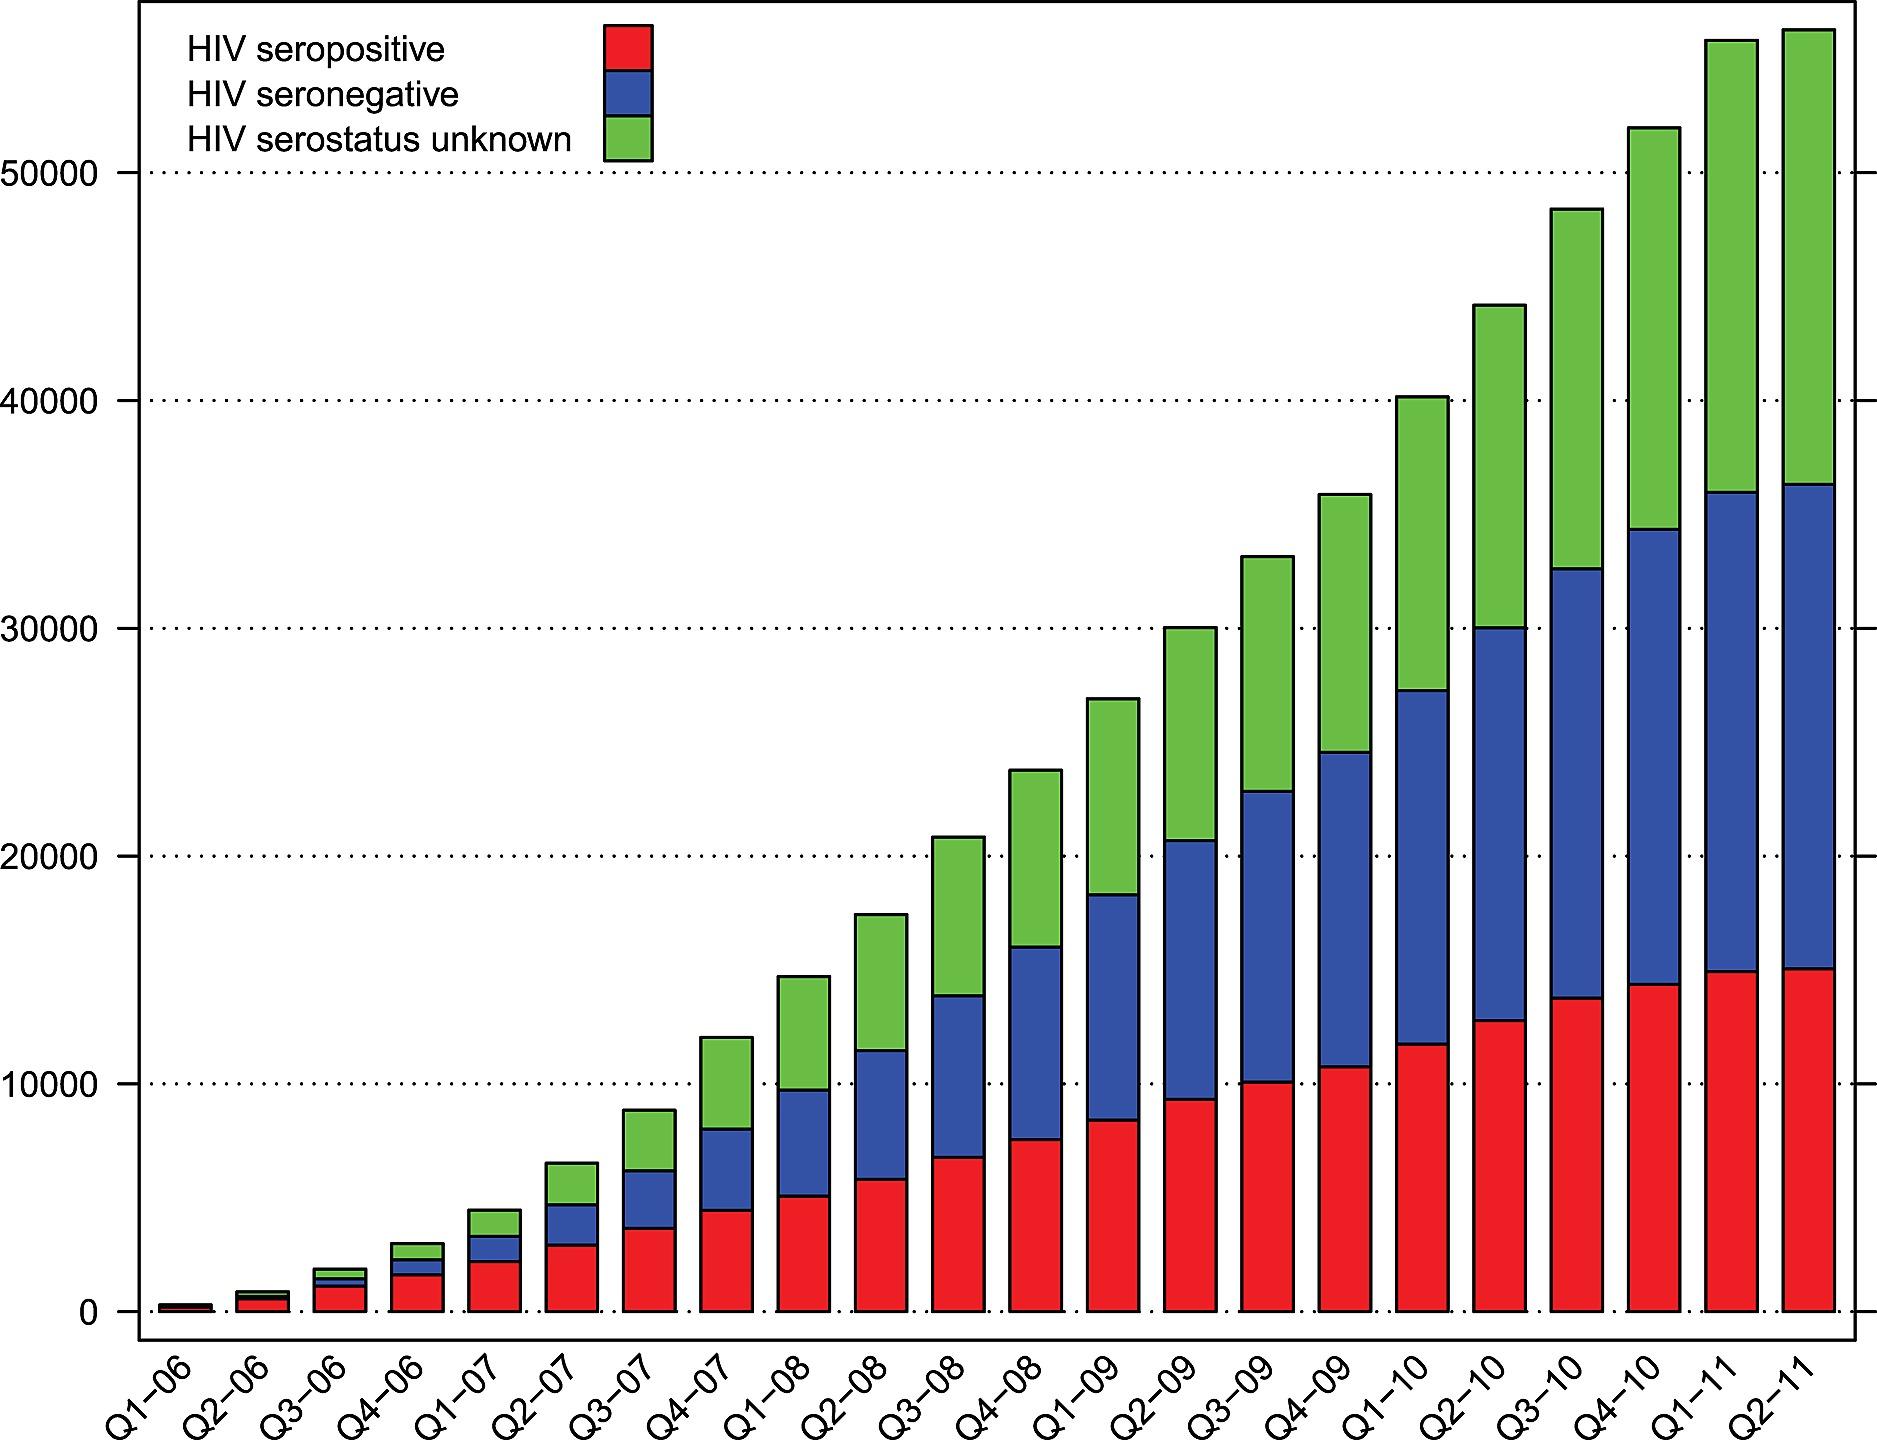 virus de papiloma humano en hombres respiratory papillomatosis symptoms in adults